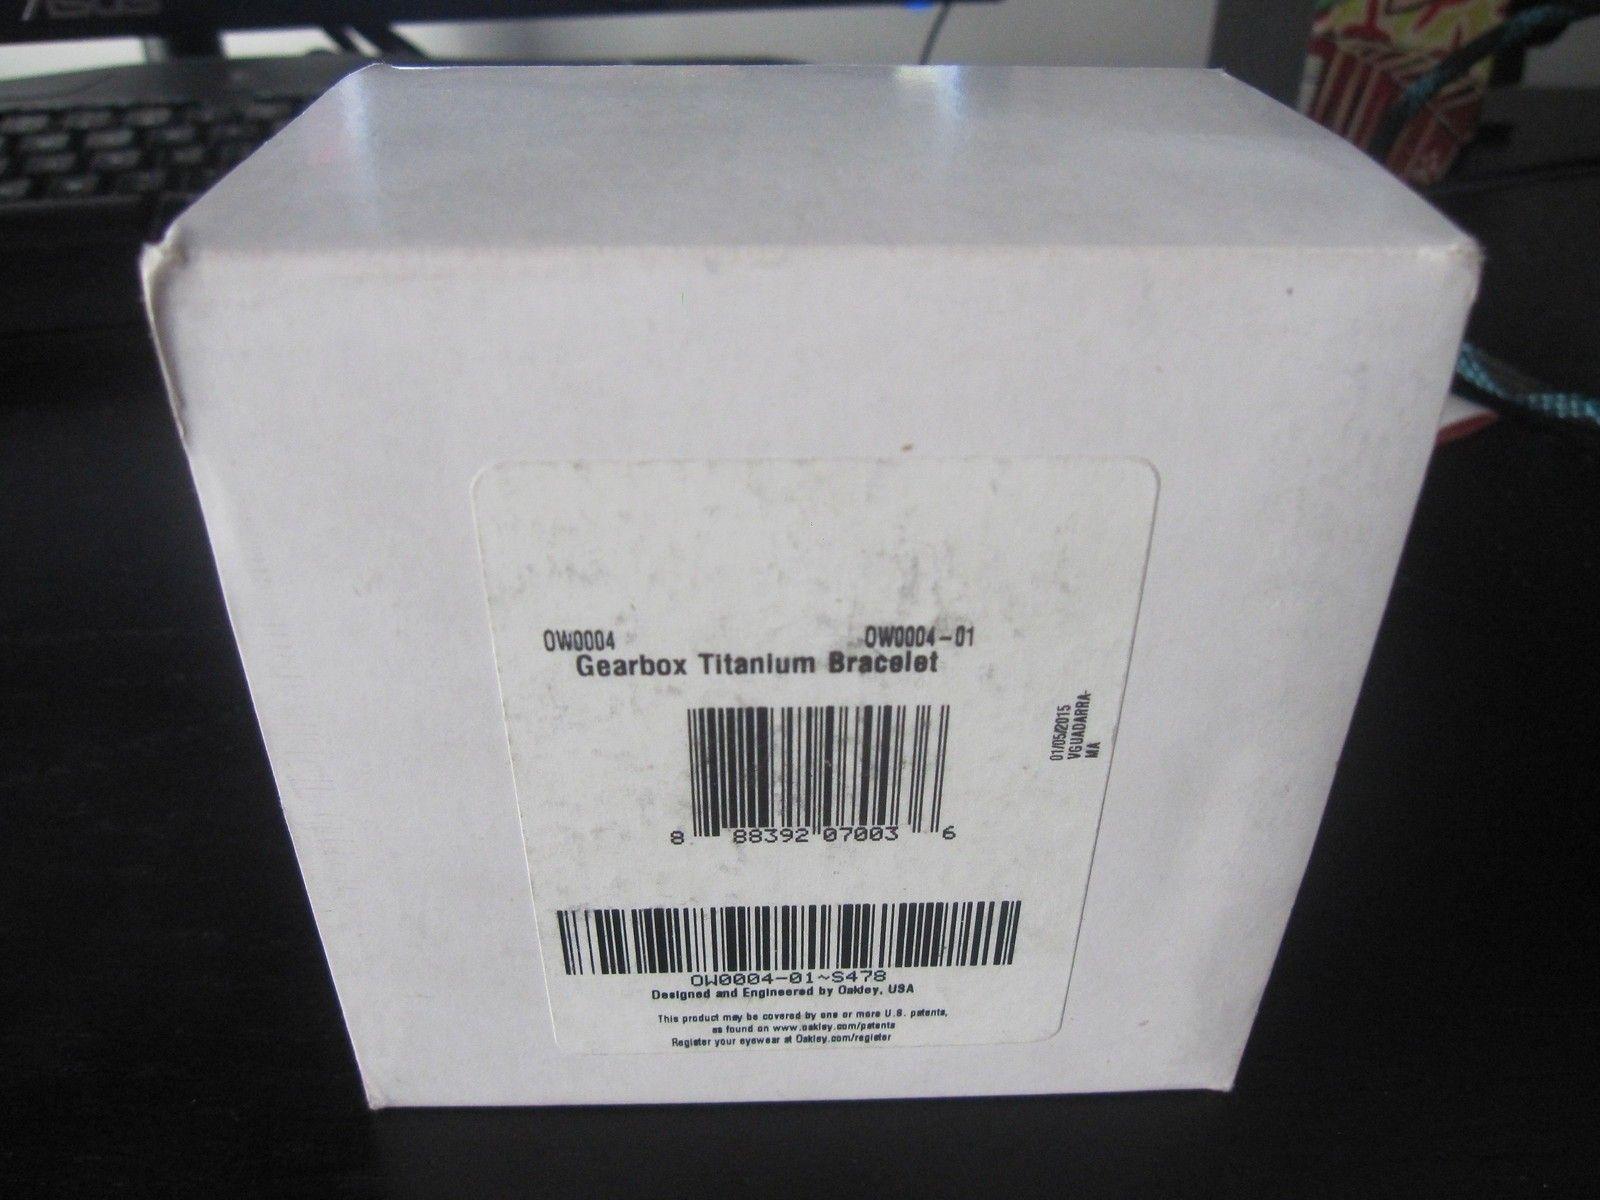 BNIB Gearbox Titanium Bracelet Watch - OW0004-01 - IMG_2067.JPG